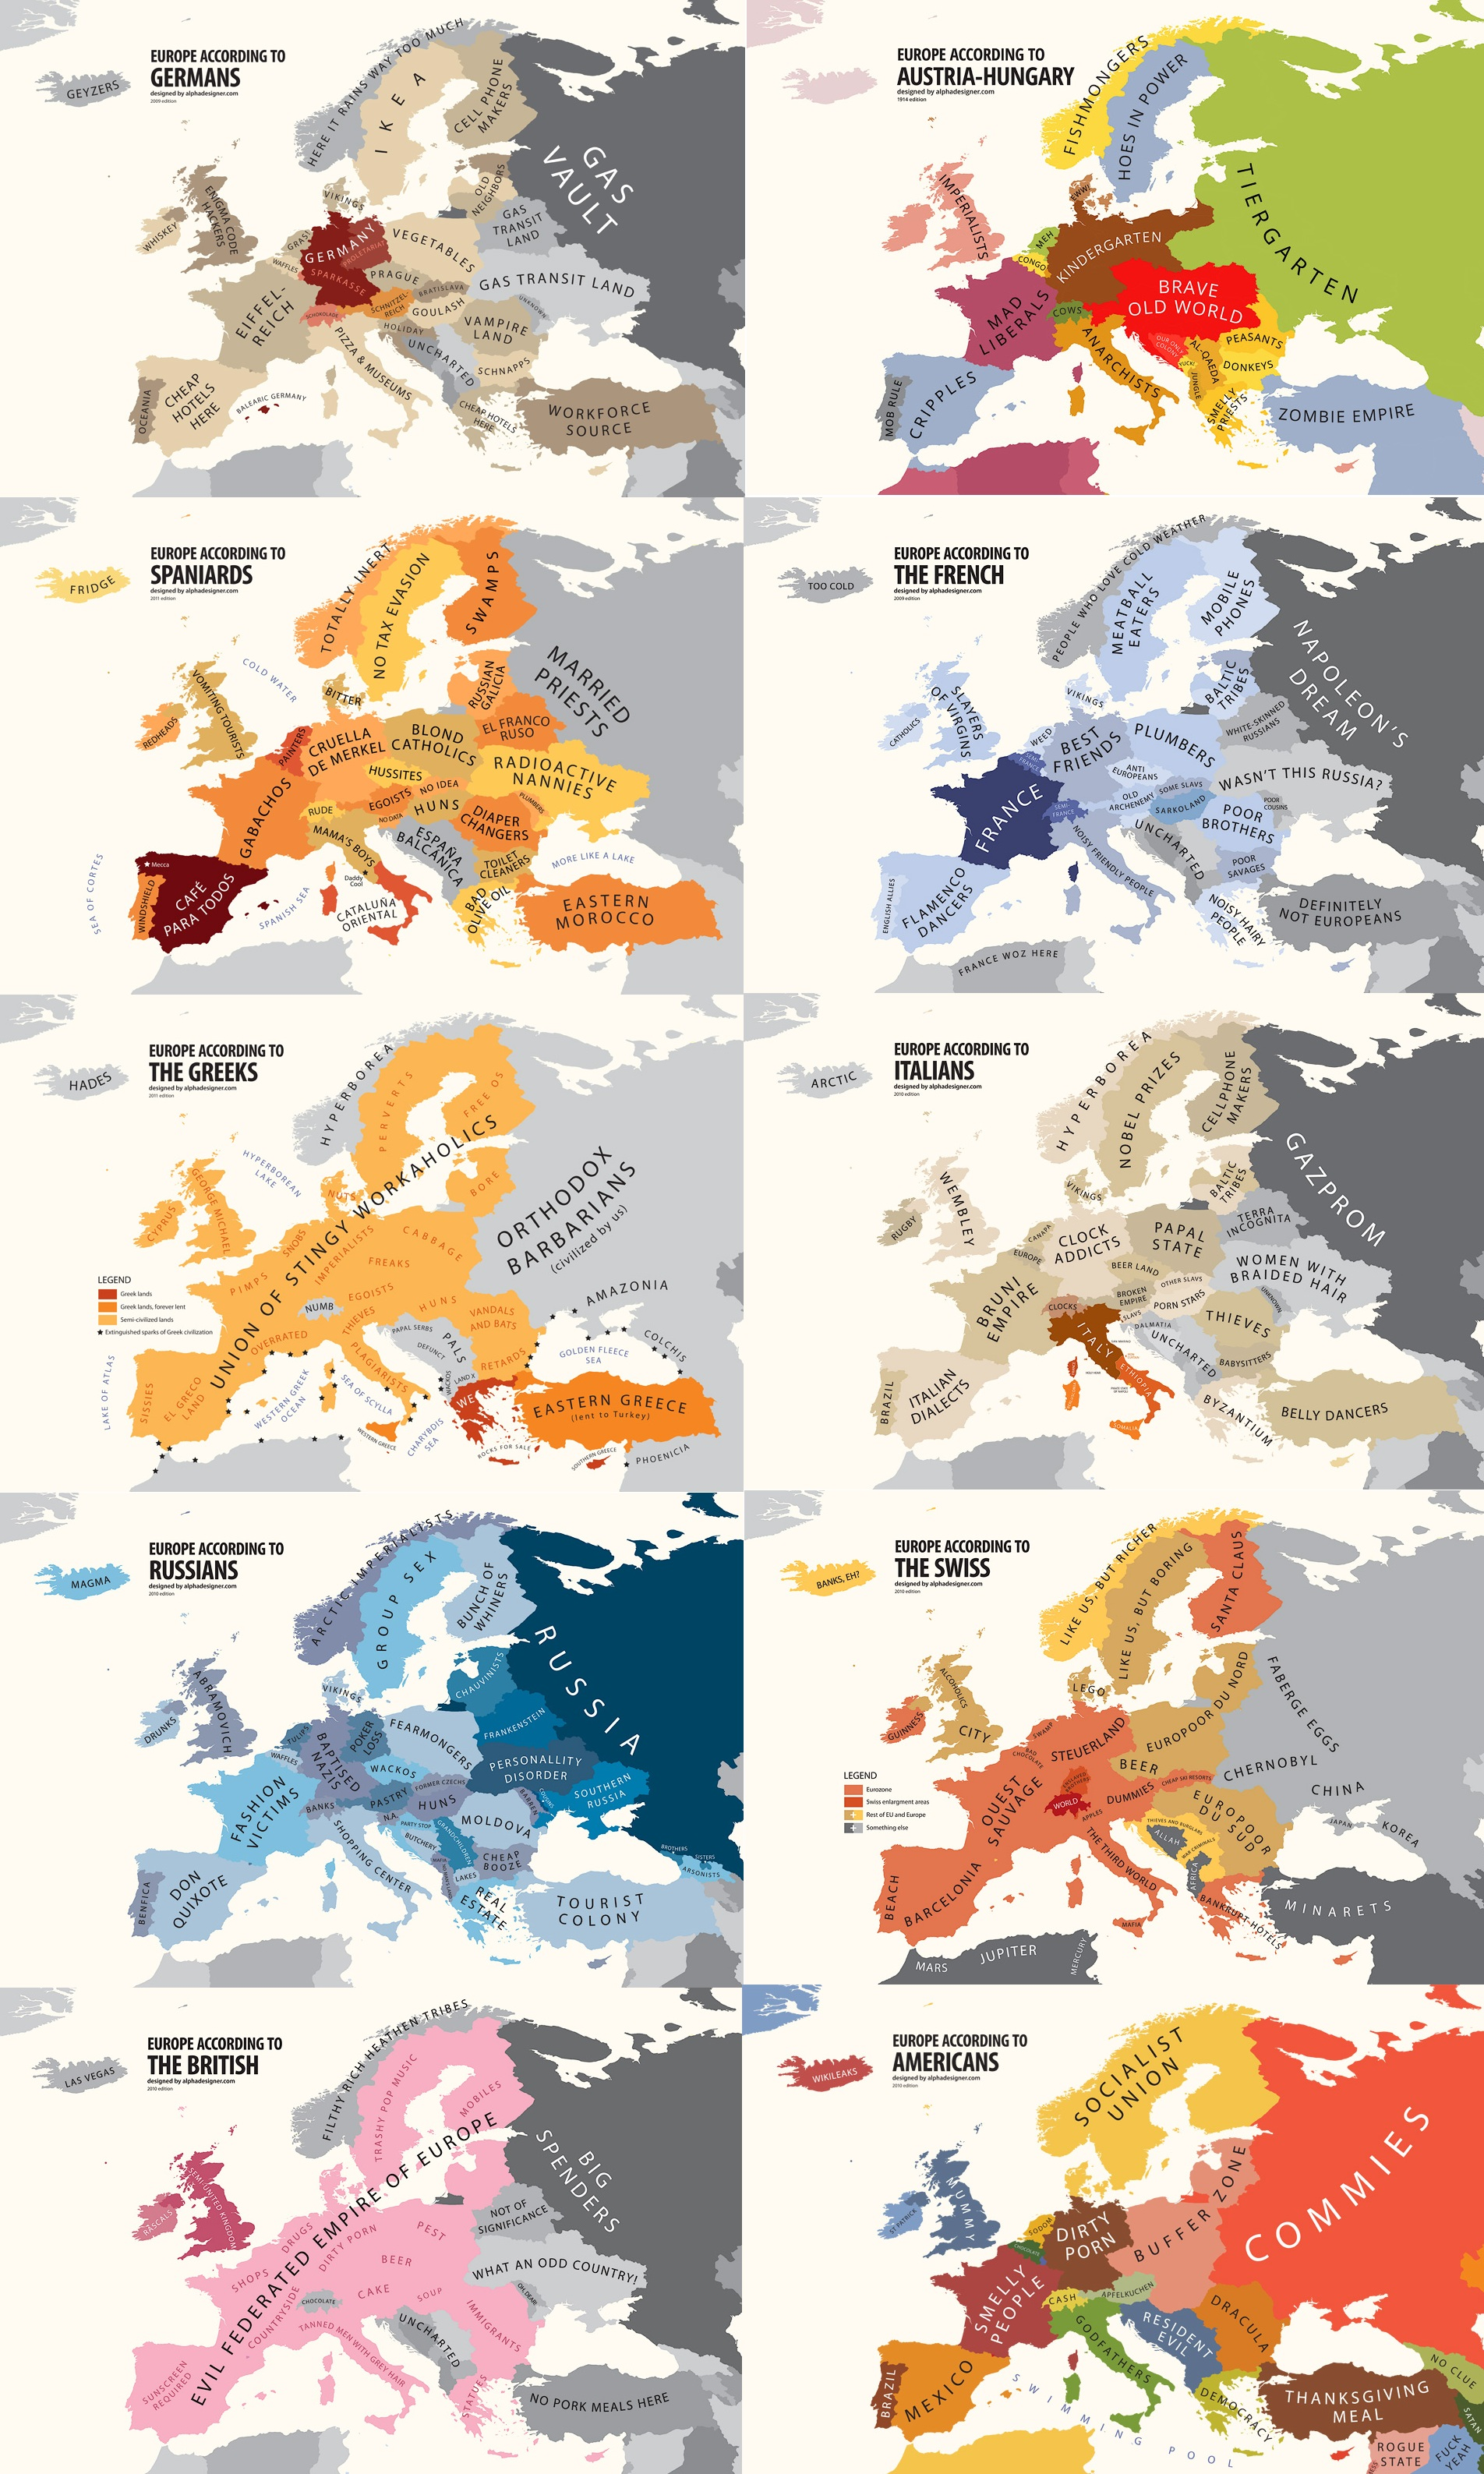 europe-according-to